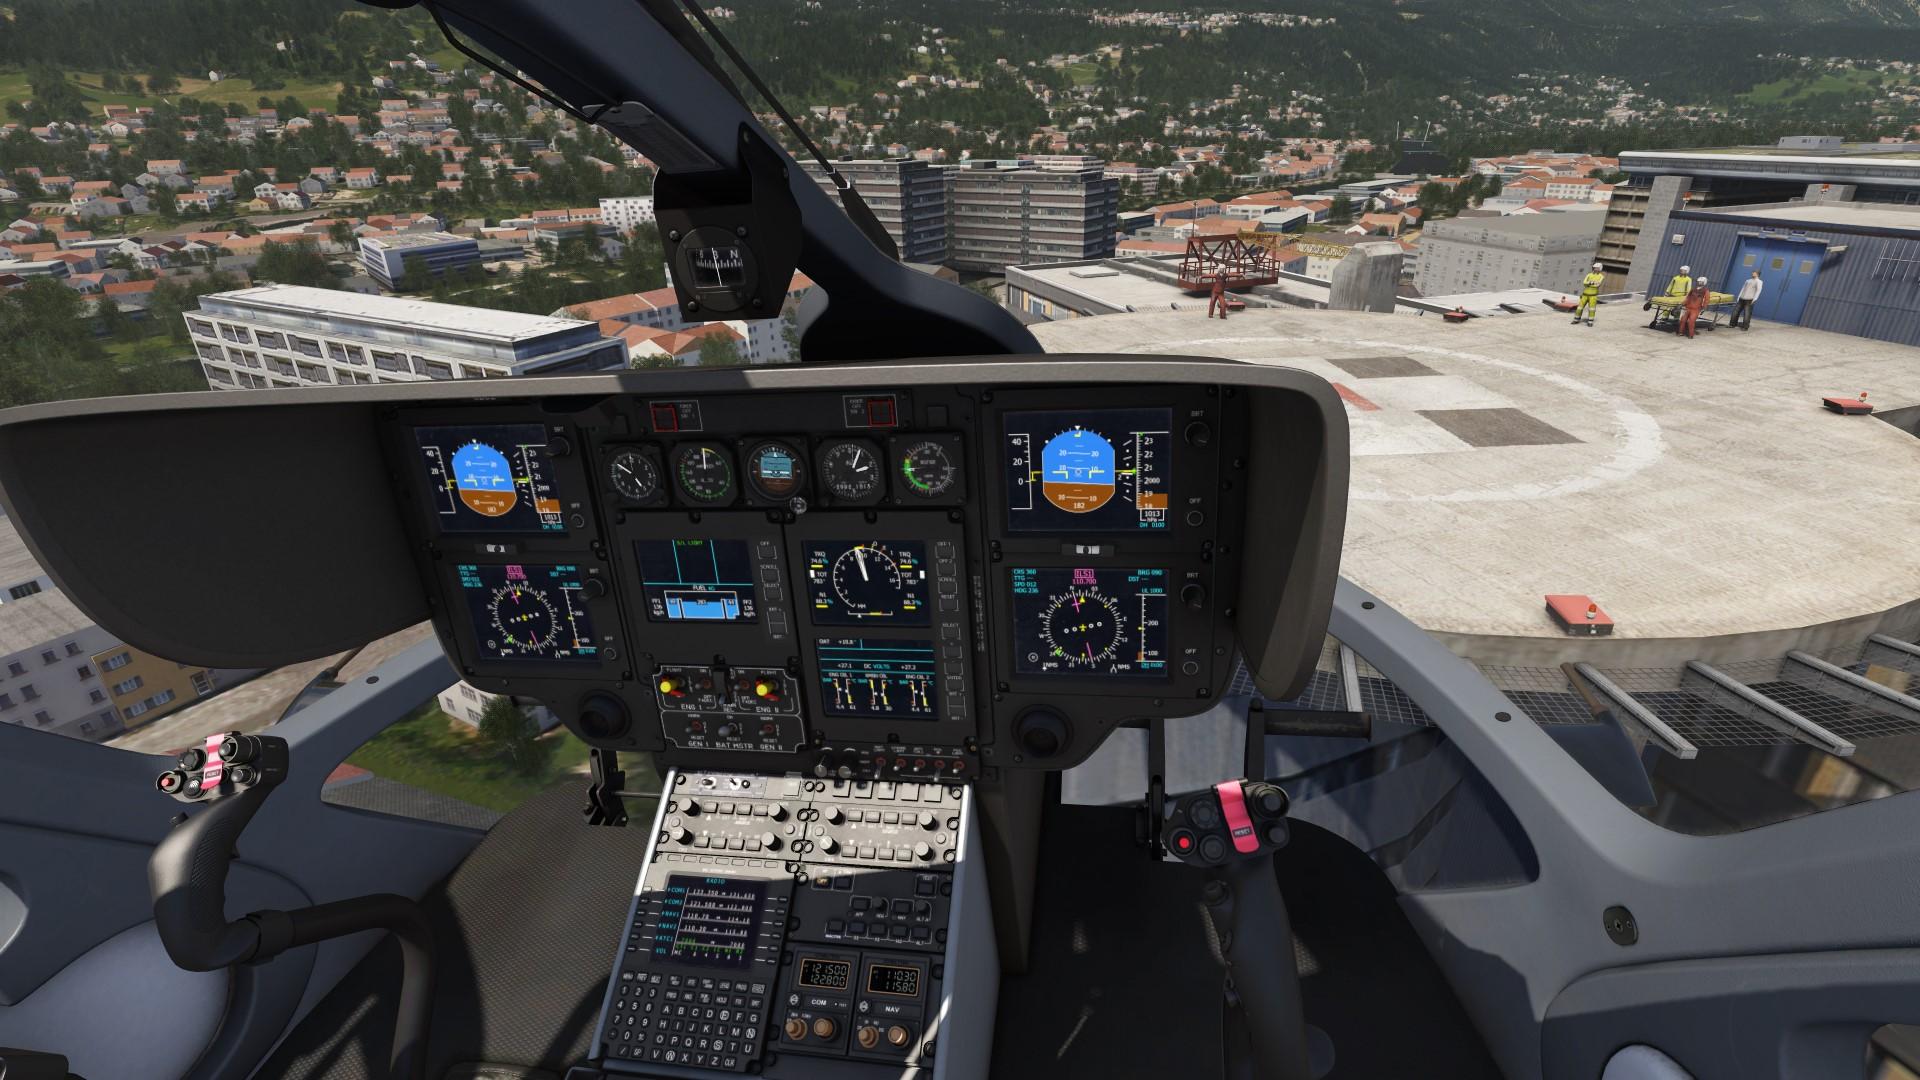 25908-aerofly-fs-2-screenshot-ec135-cock